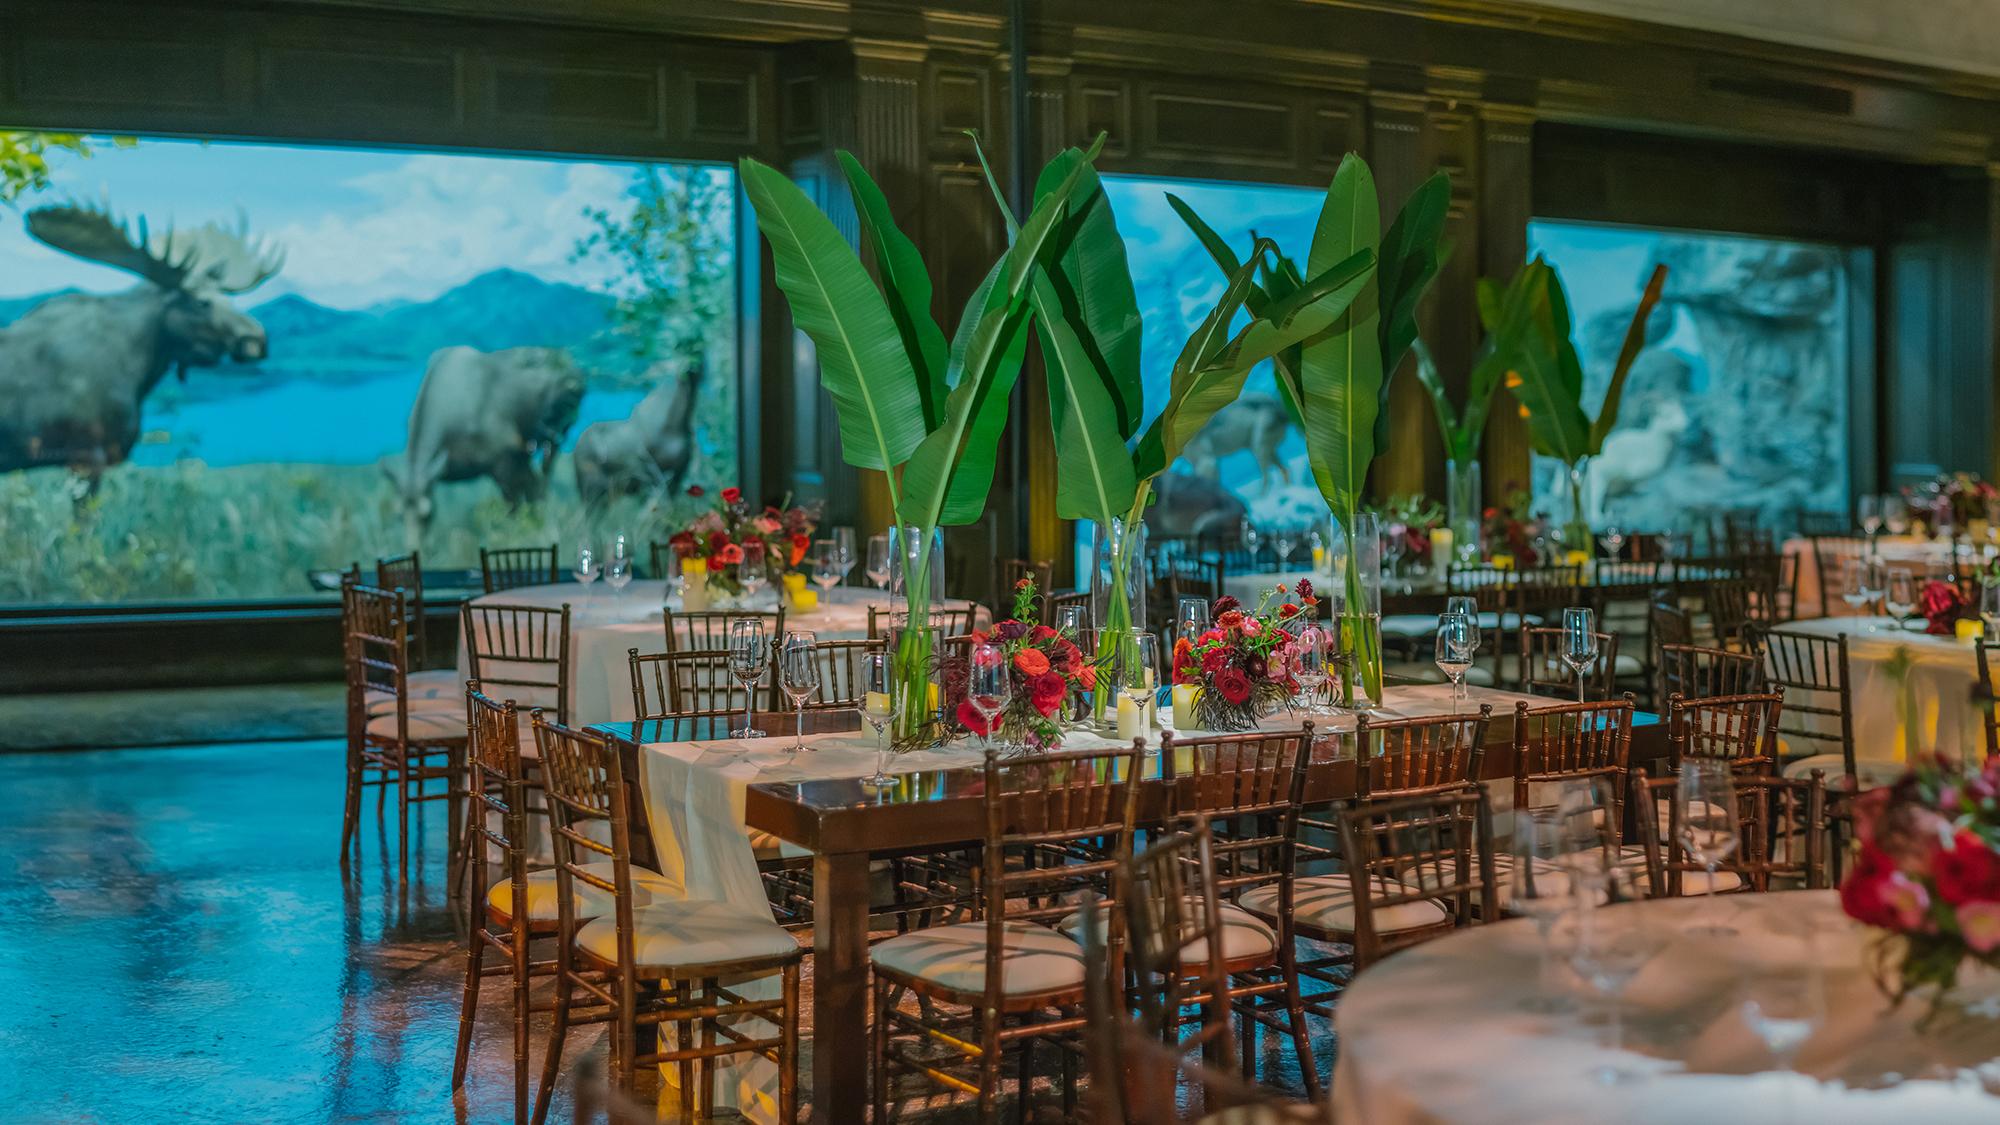 duff goldman johnna colbry wedding reception space